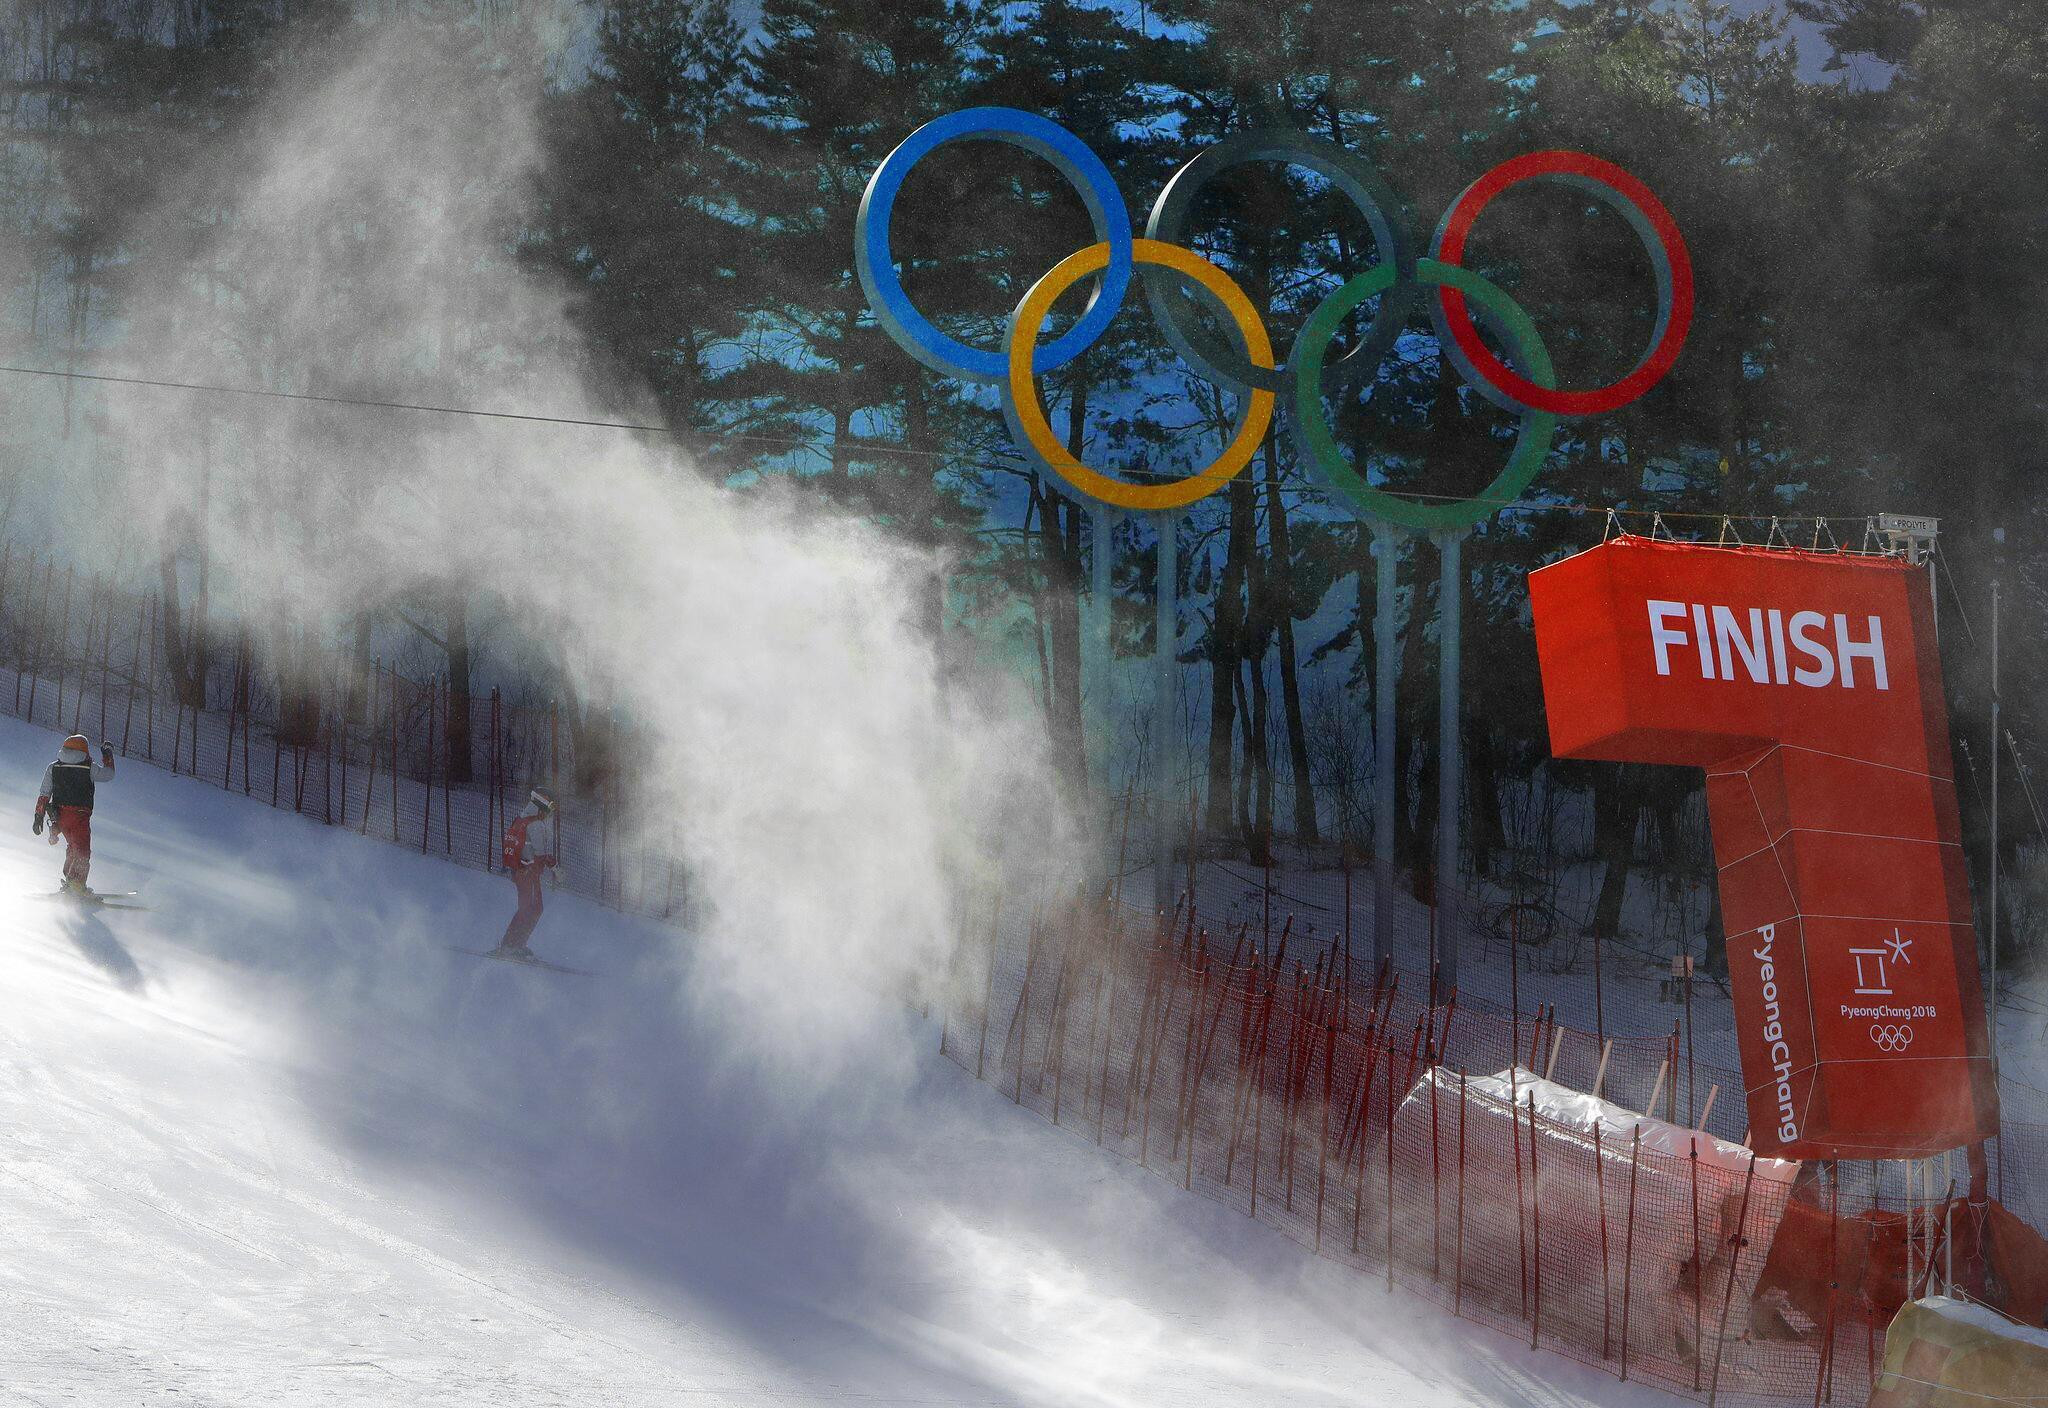 Bild zu Pyeongchang 2018, Ski alpin